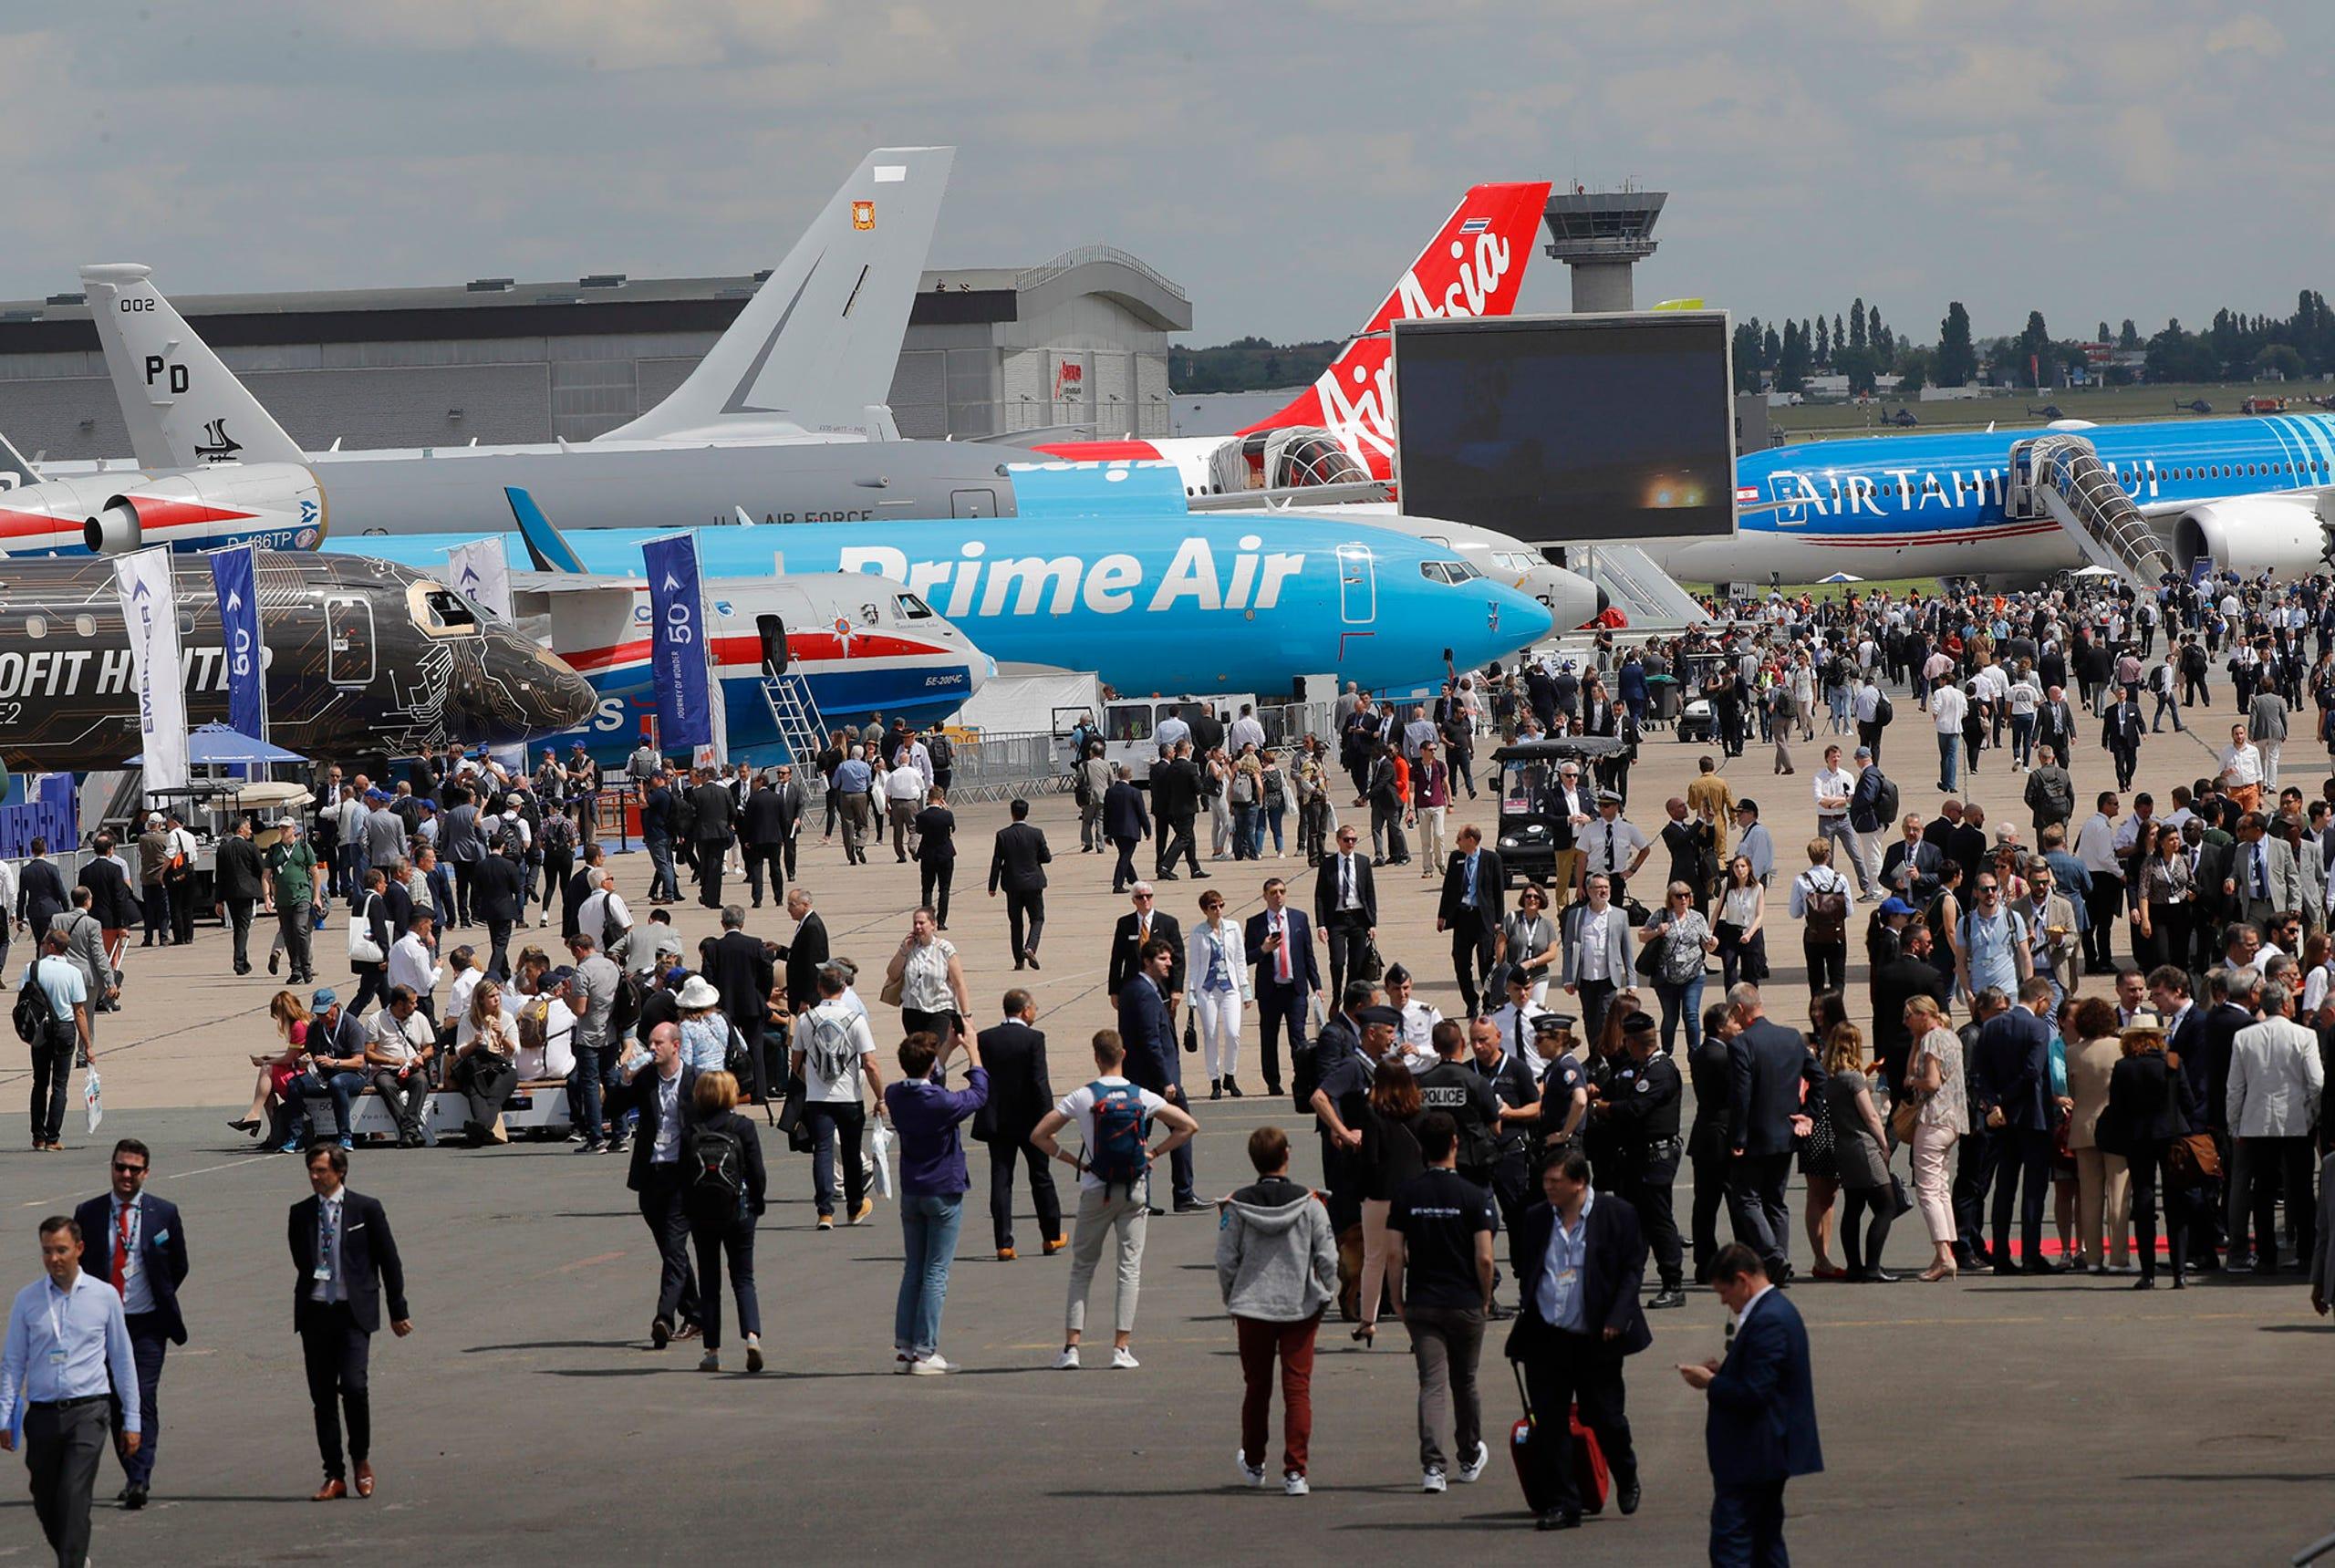 Visitors walk on the tarmac at the Paris Air Show, June 17, 2019.